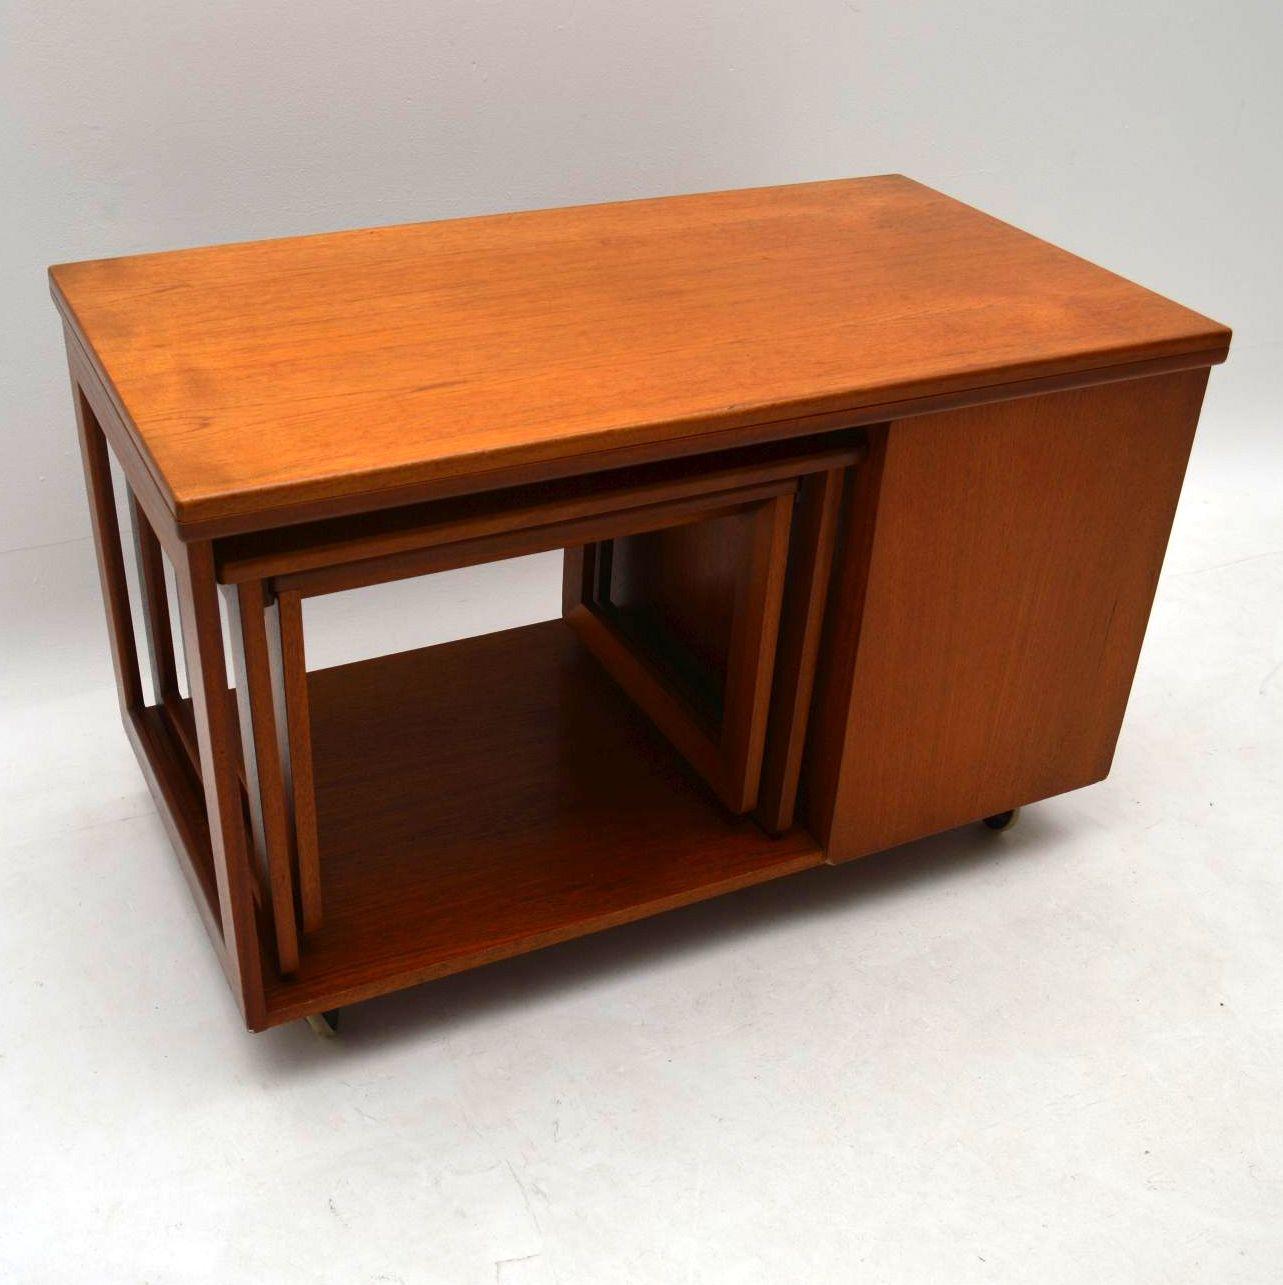 1960 S Teak Tristor Coffee Table By Mcintosh